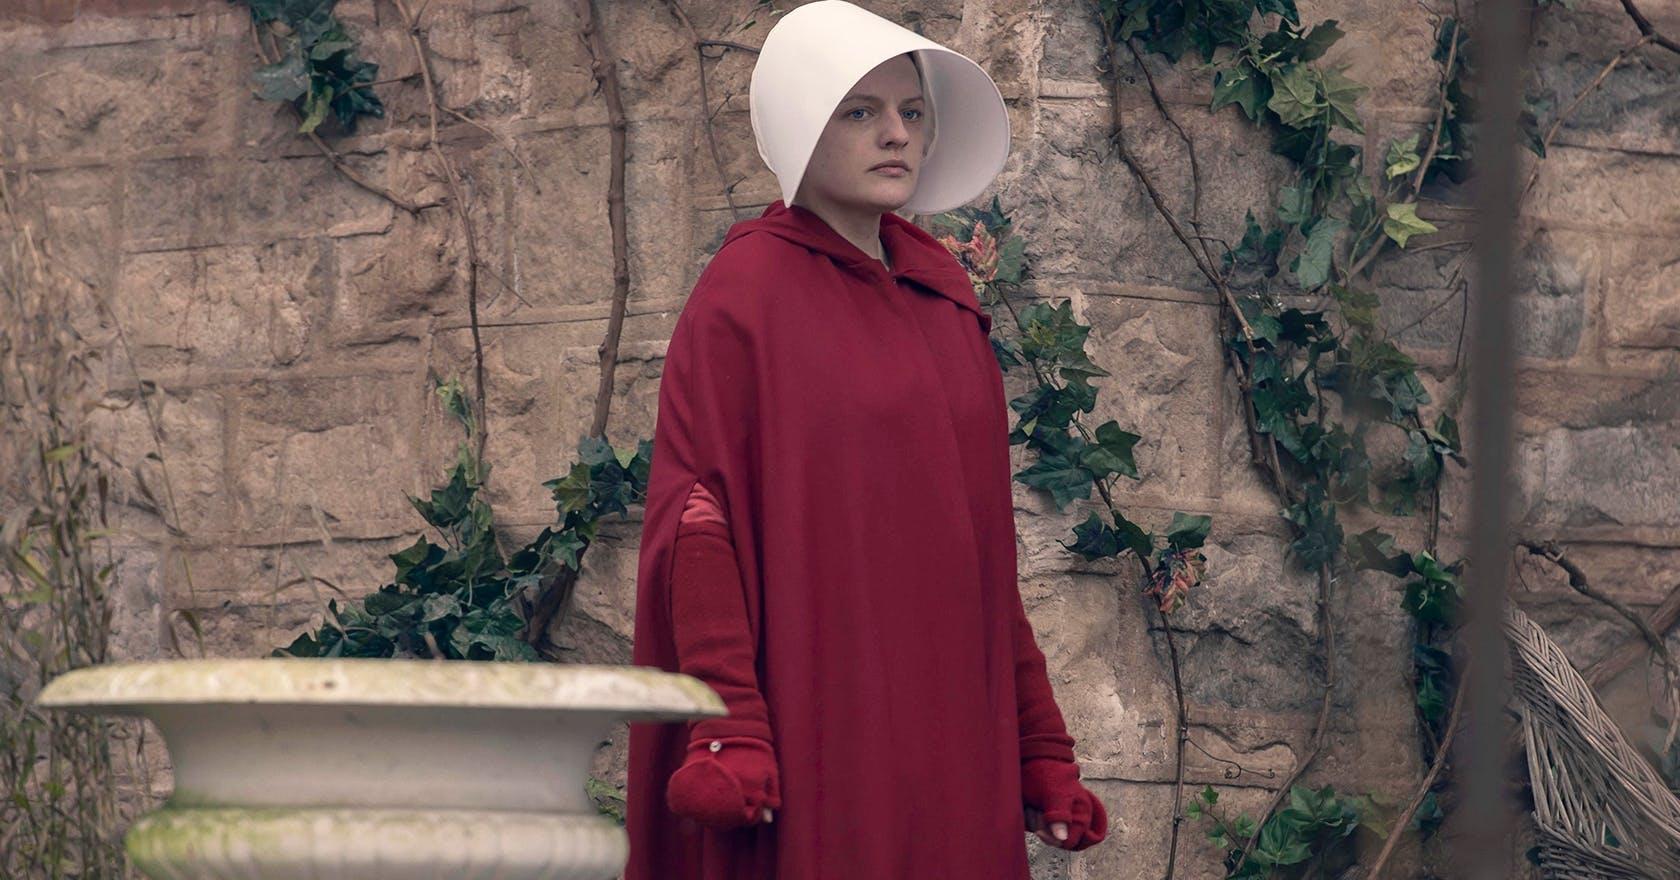 Elisabeth Moss' new wellbeing hack? Filming The Handmaid's Tale